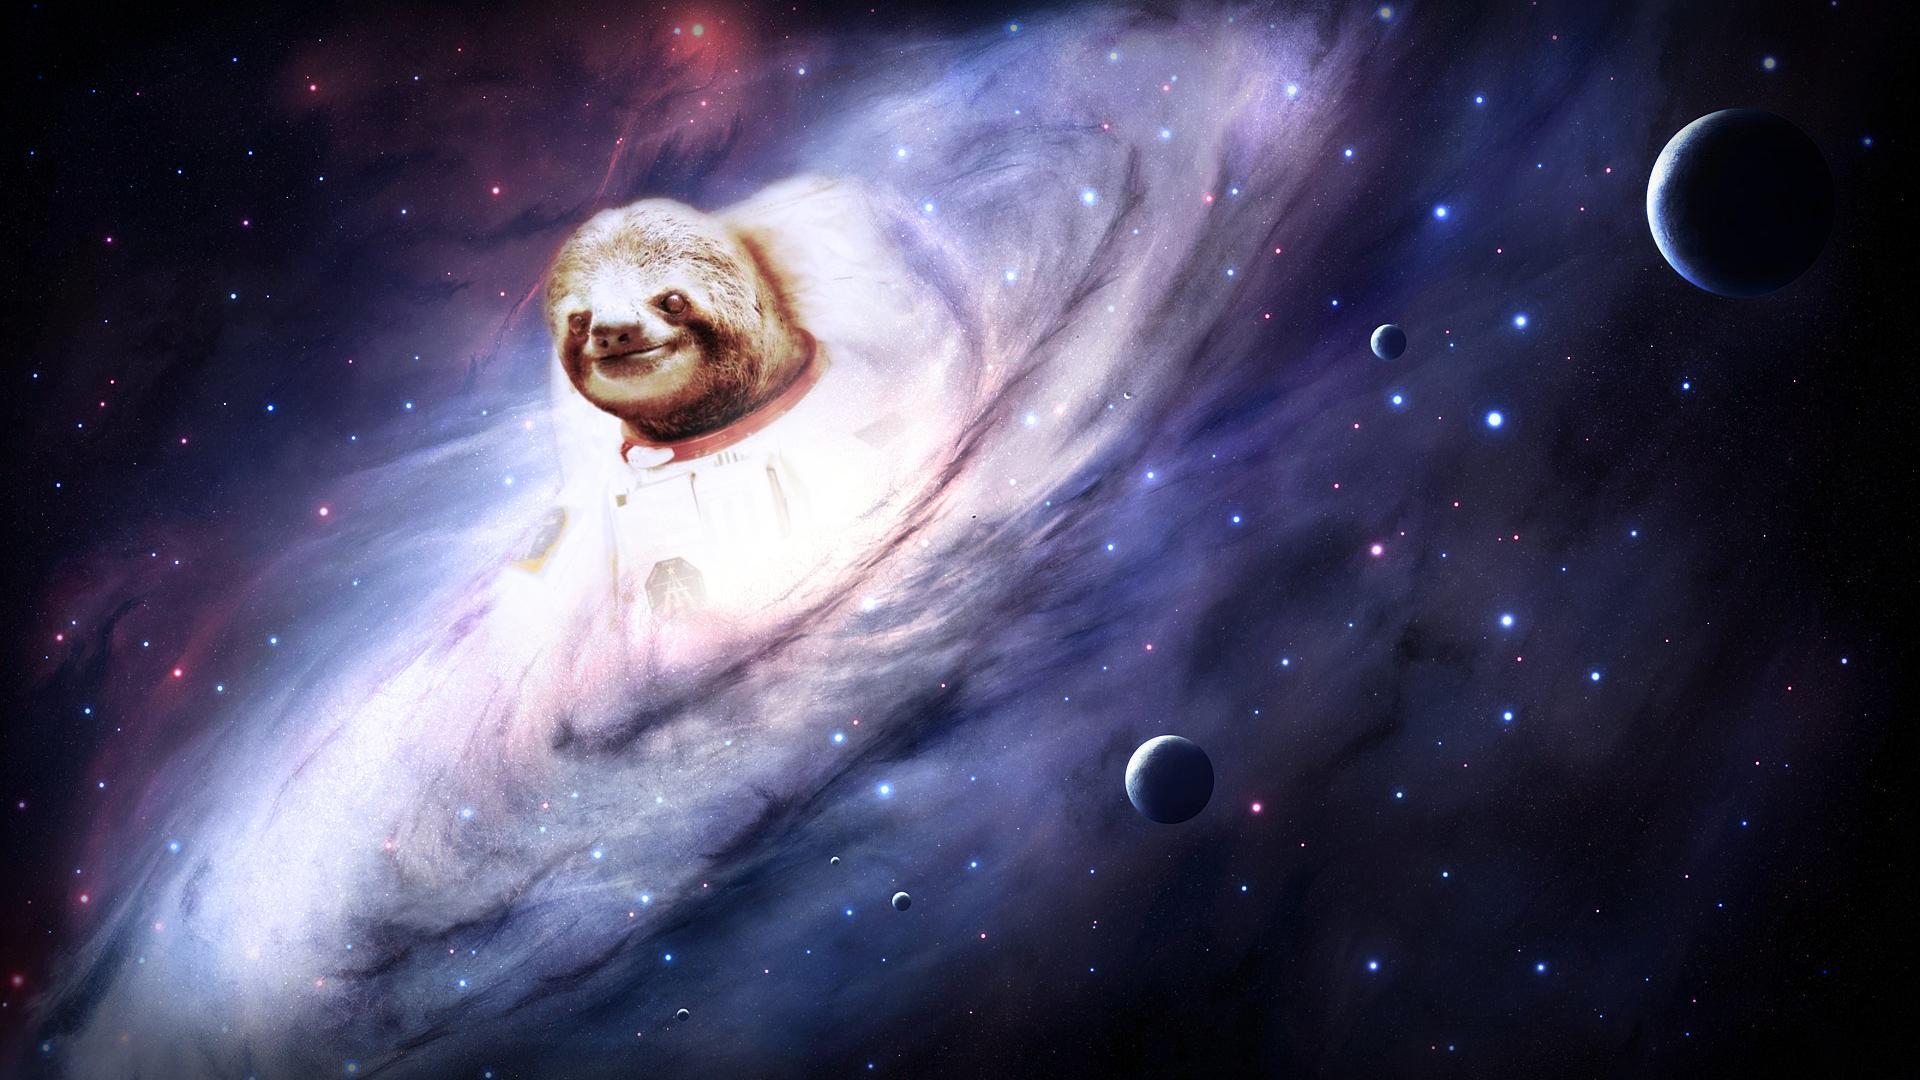 Wallpaper 4 Sloths Know Your Meme